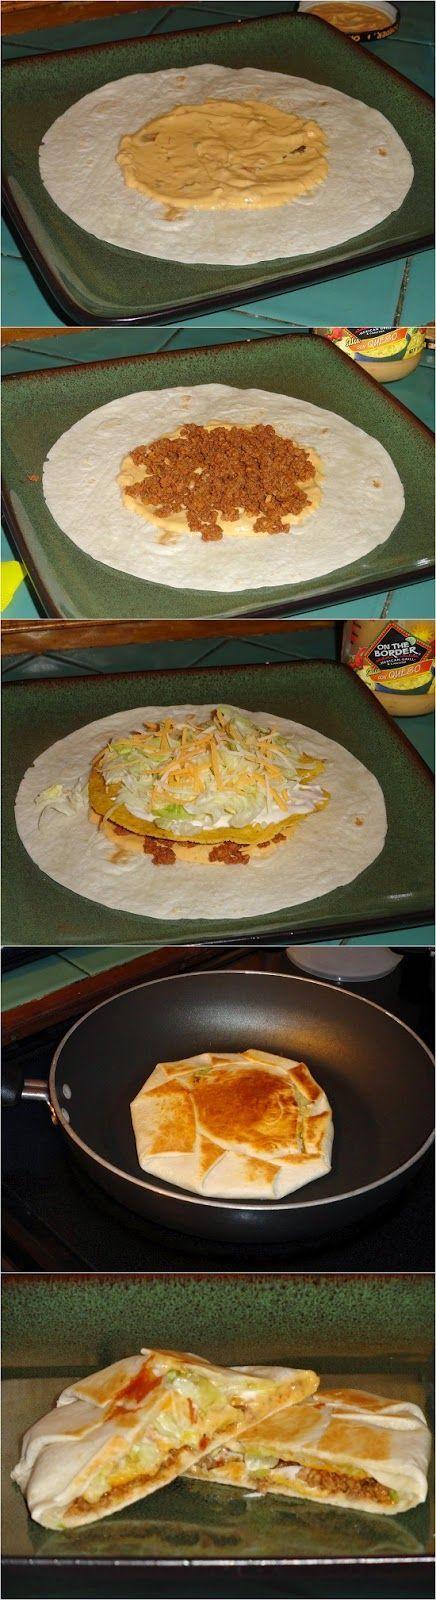 6/12/14 Homemake Crunchwrap Supremes Recipe so easy - my fav Taco Bell item